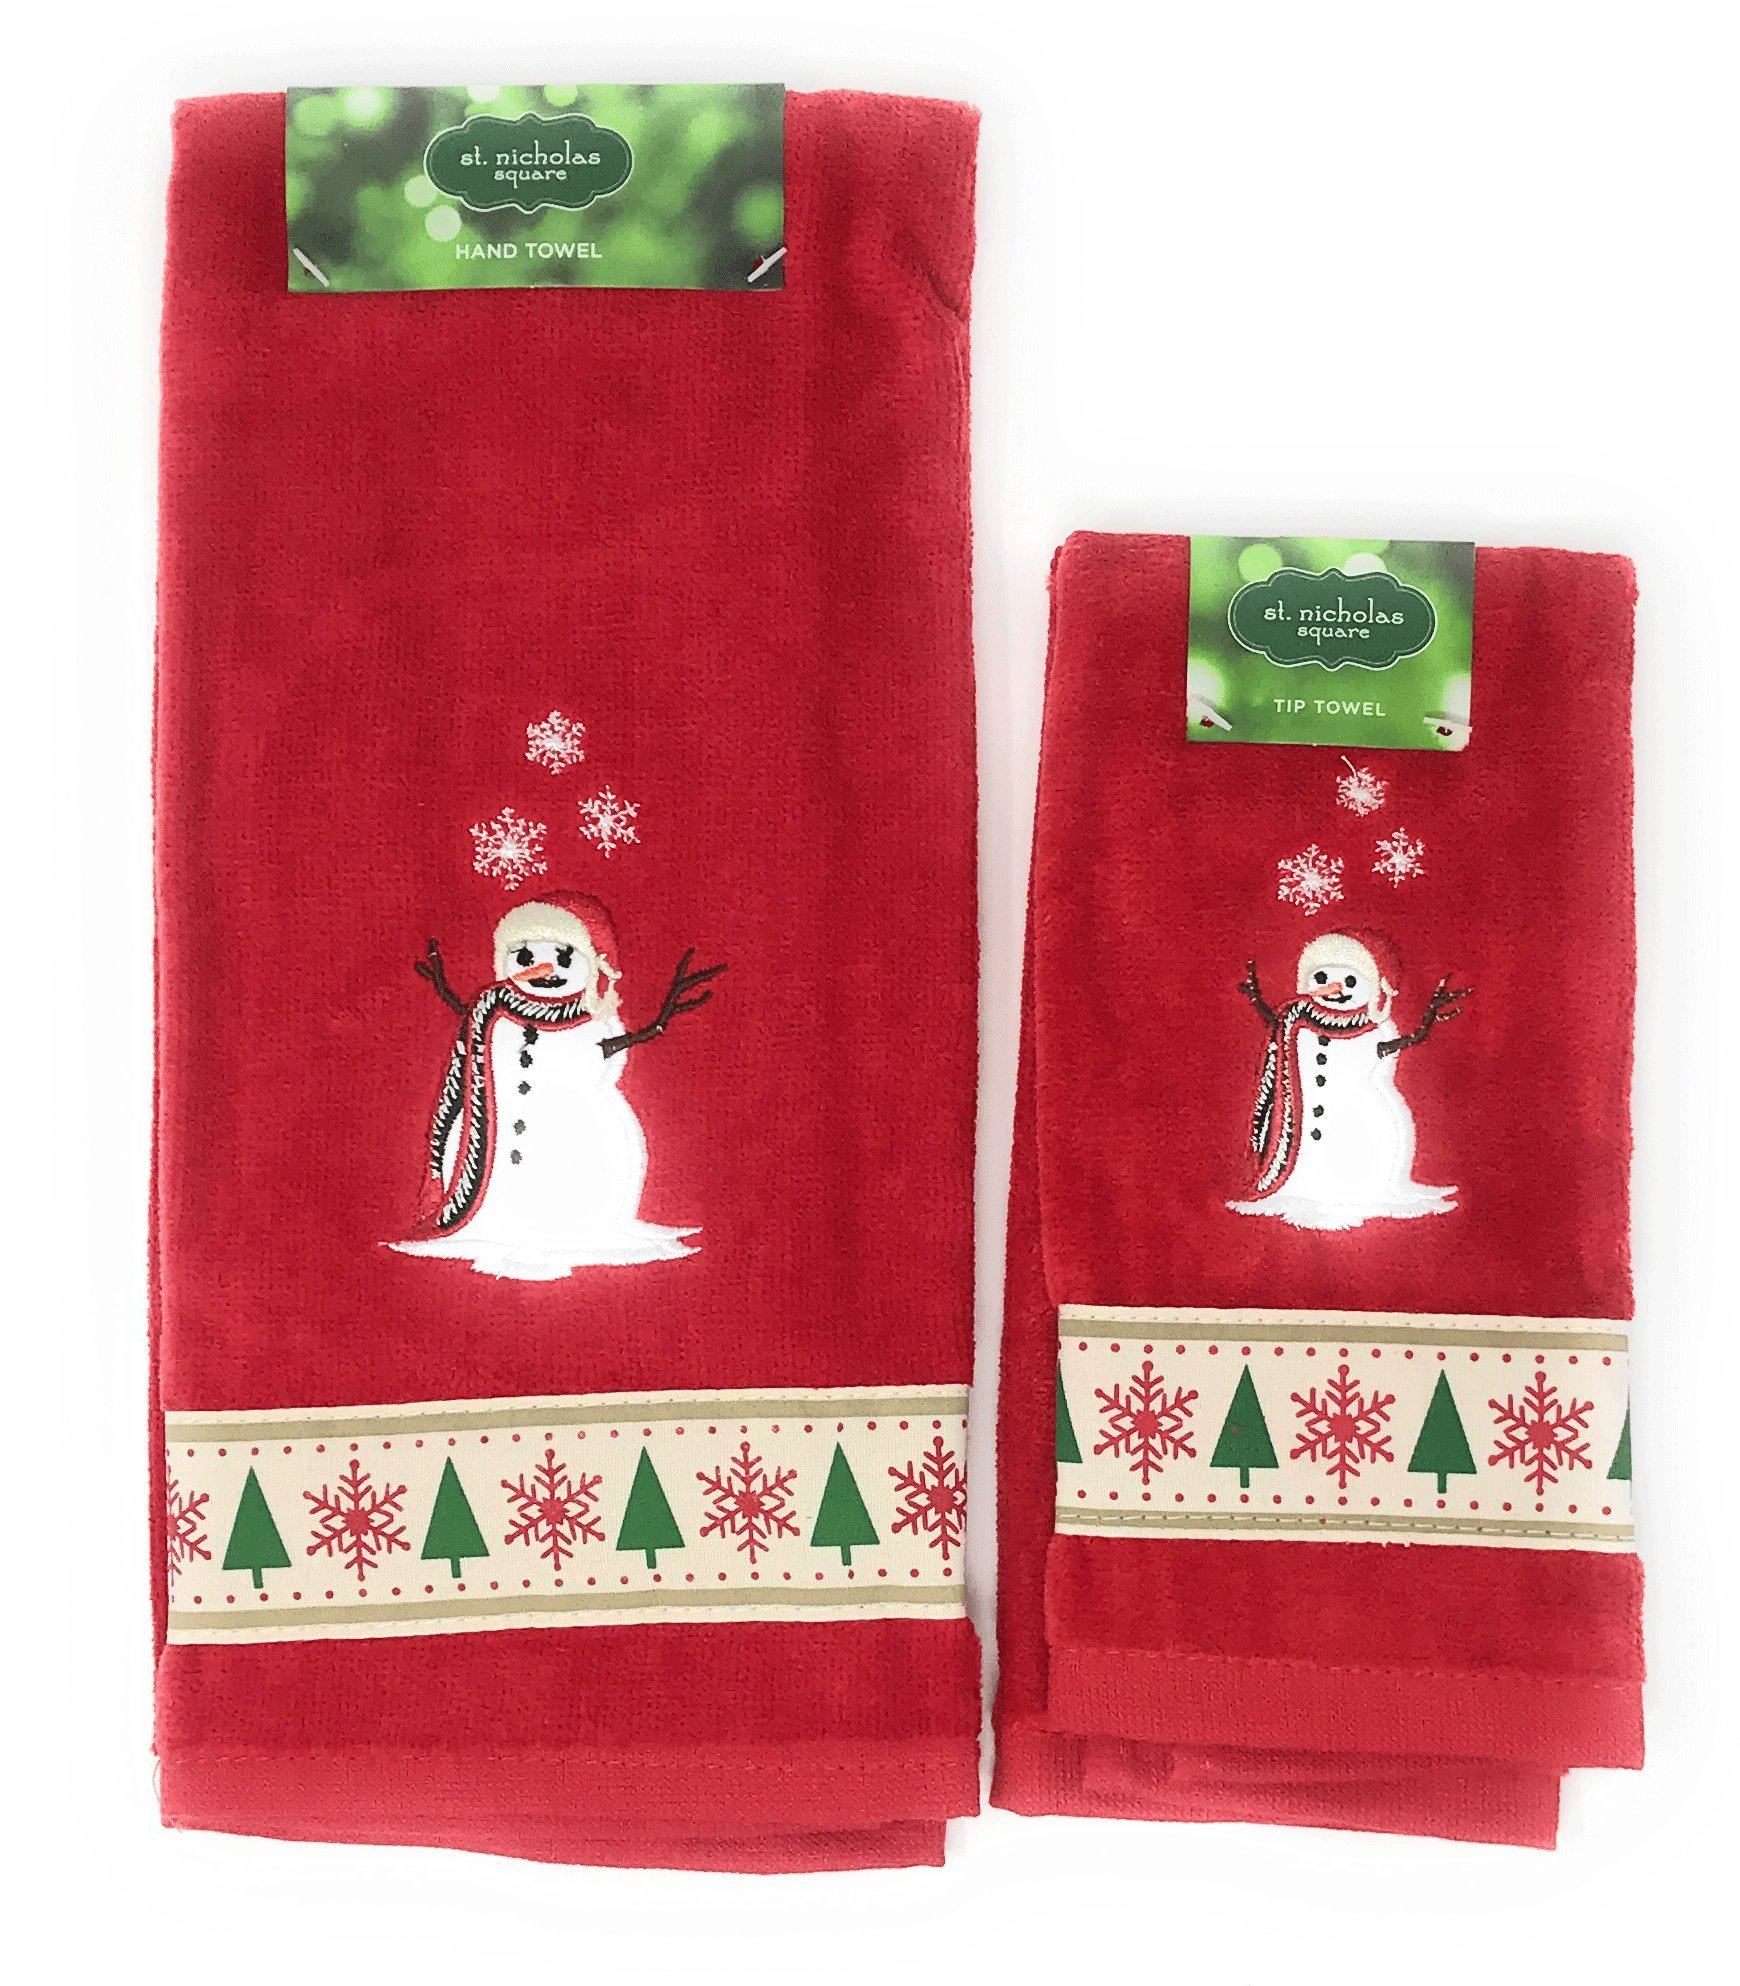 St. Nicholas Square Through the Woods Comfy Cozy Snowman Hand and Fingertip Towel Set